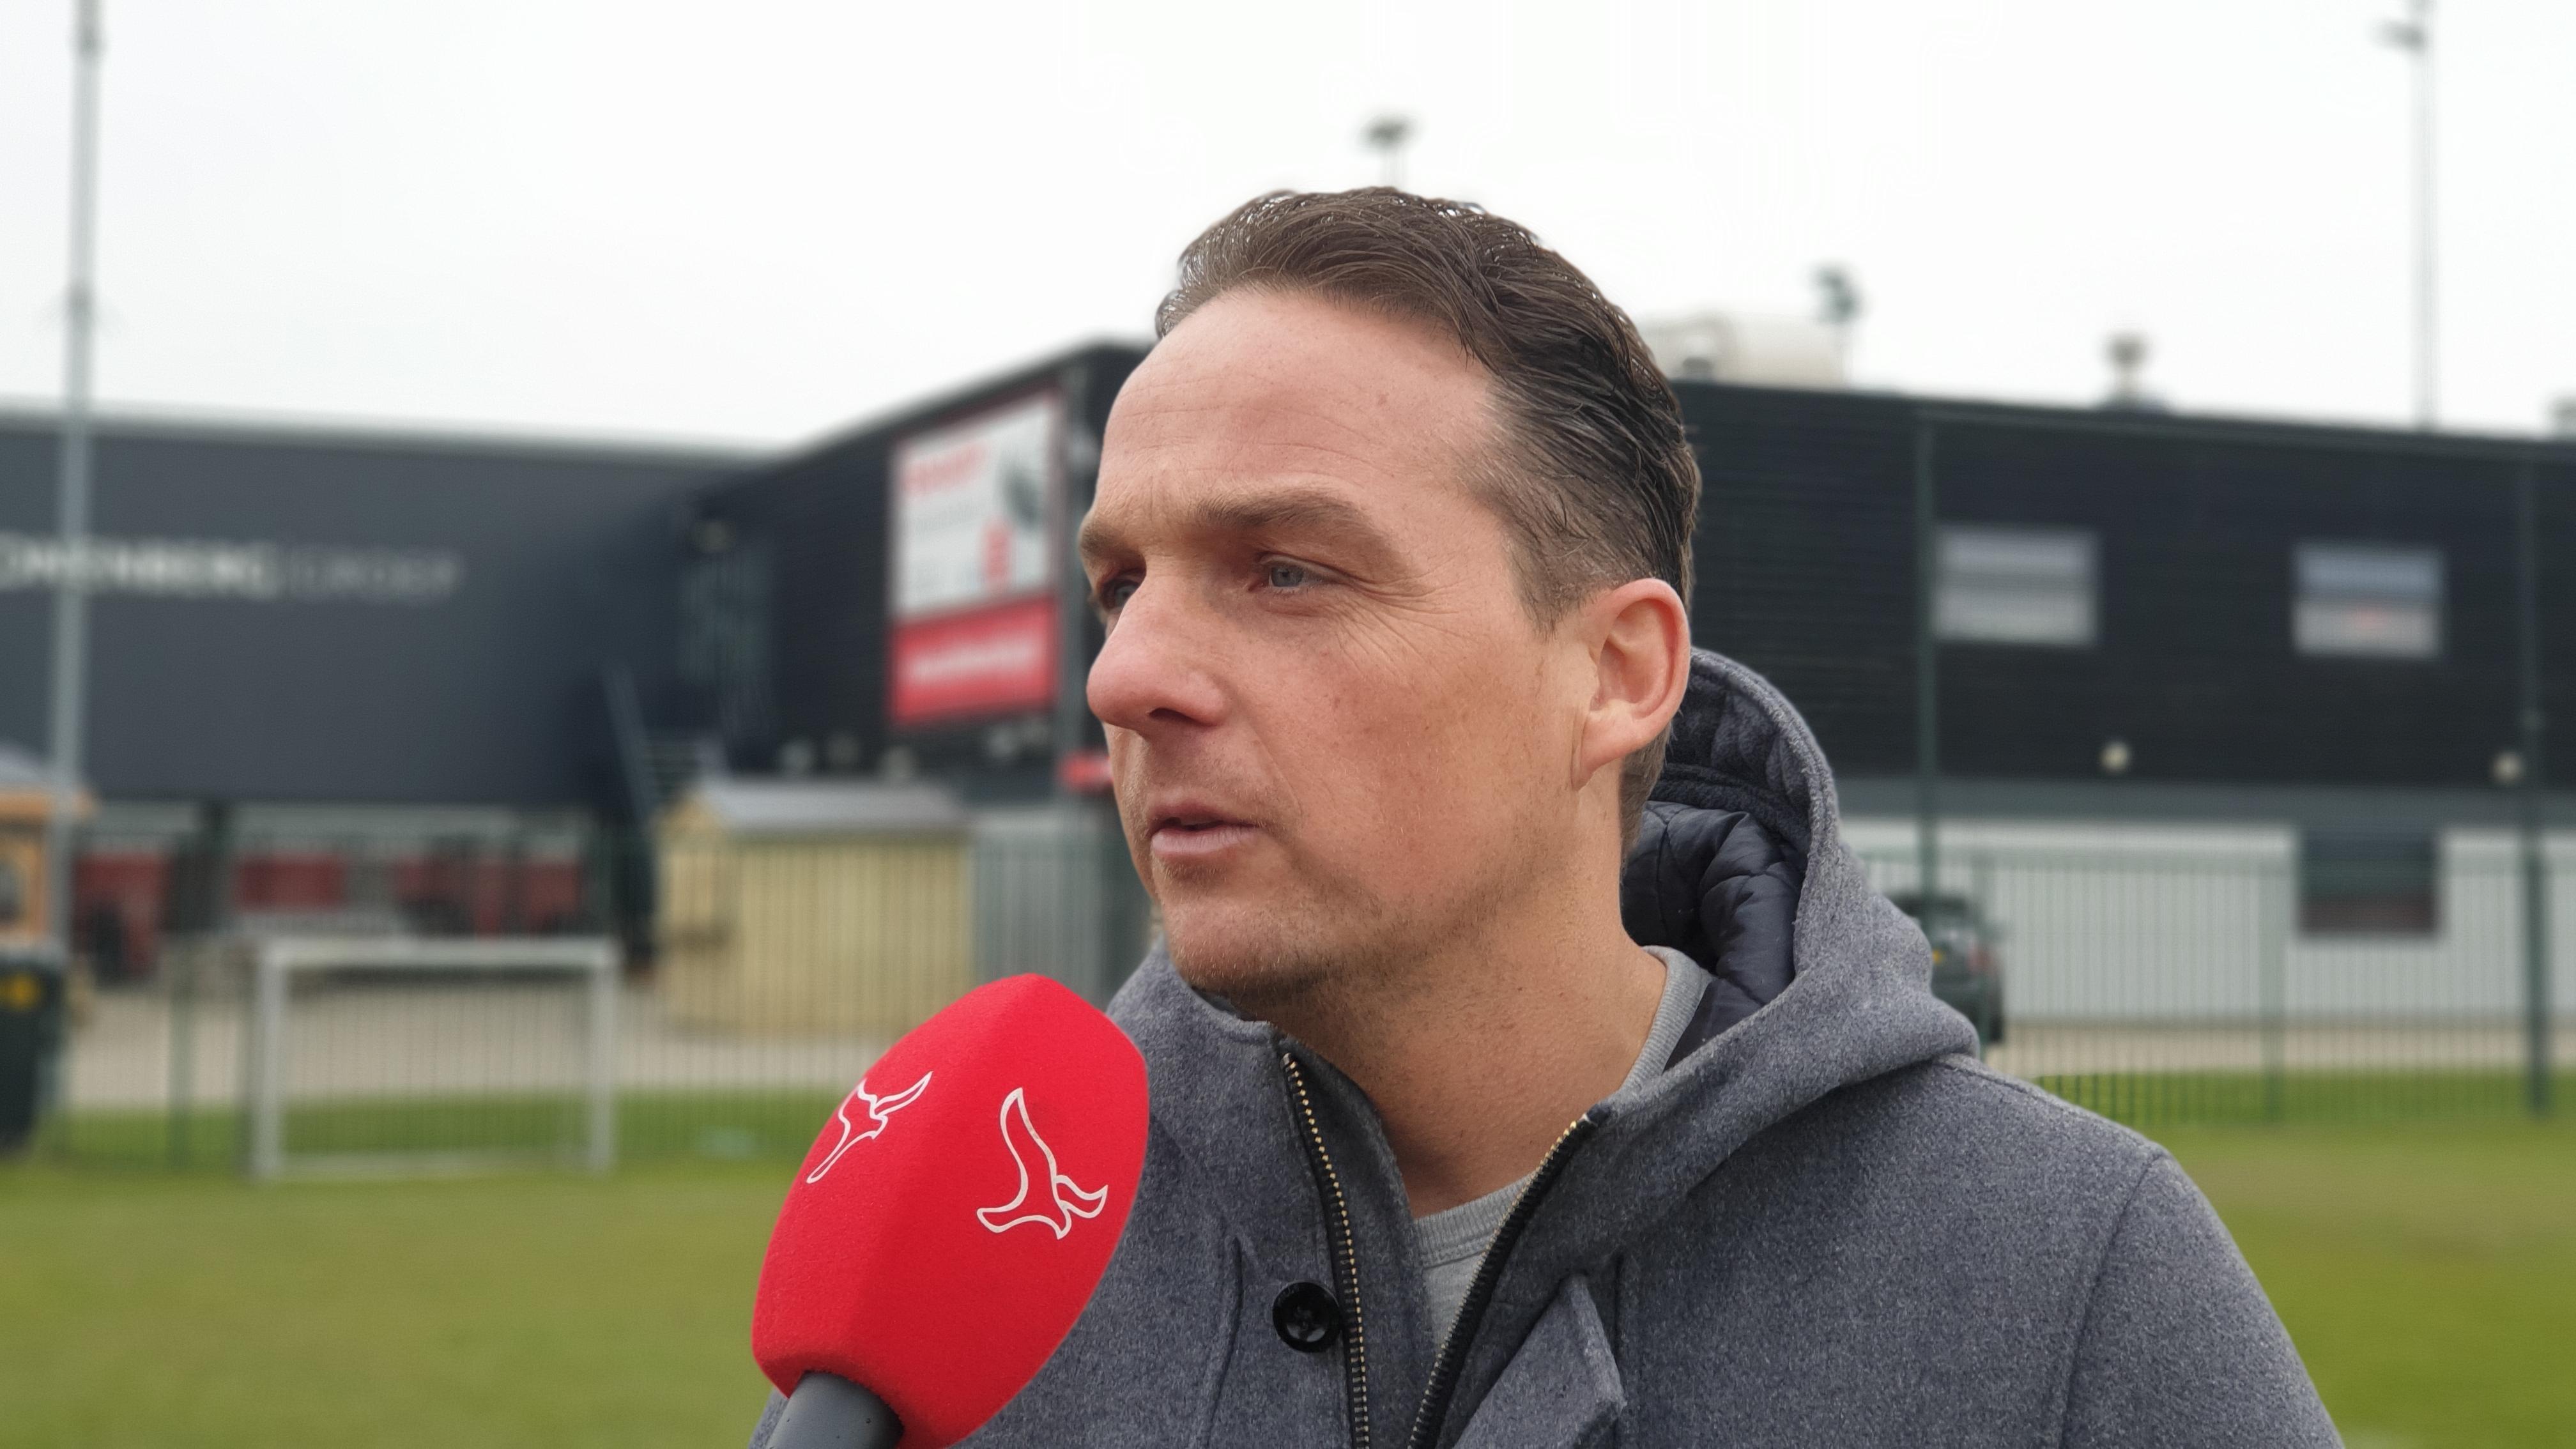 René Koster vertrekt, Jason Oost nieuwe hoofd jeugdopleiding